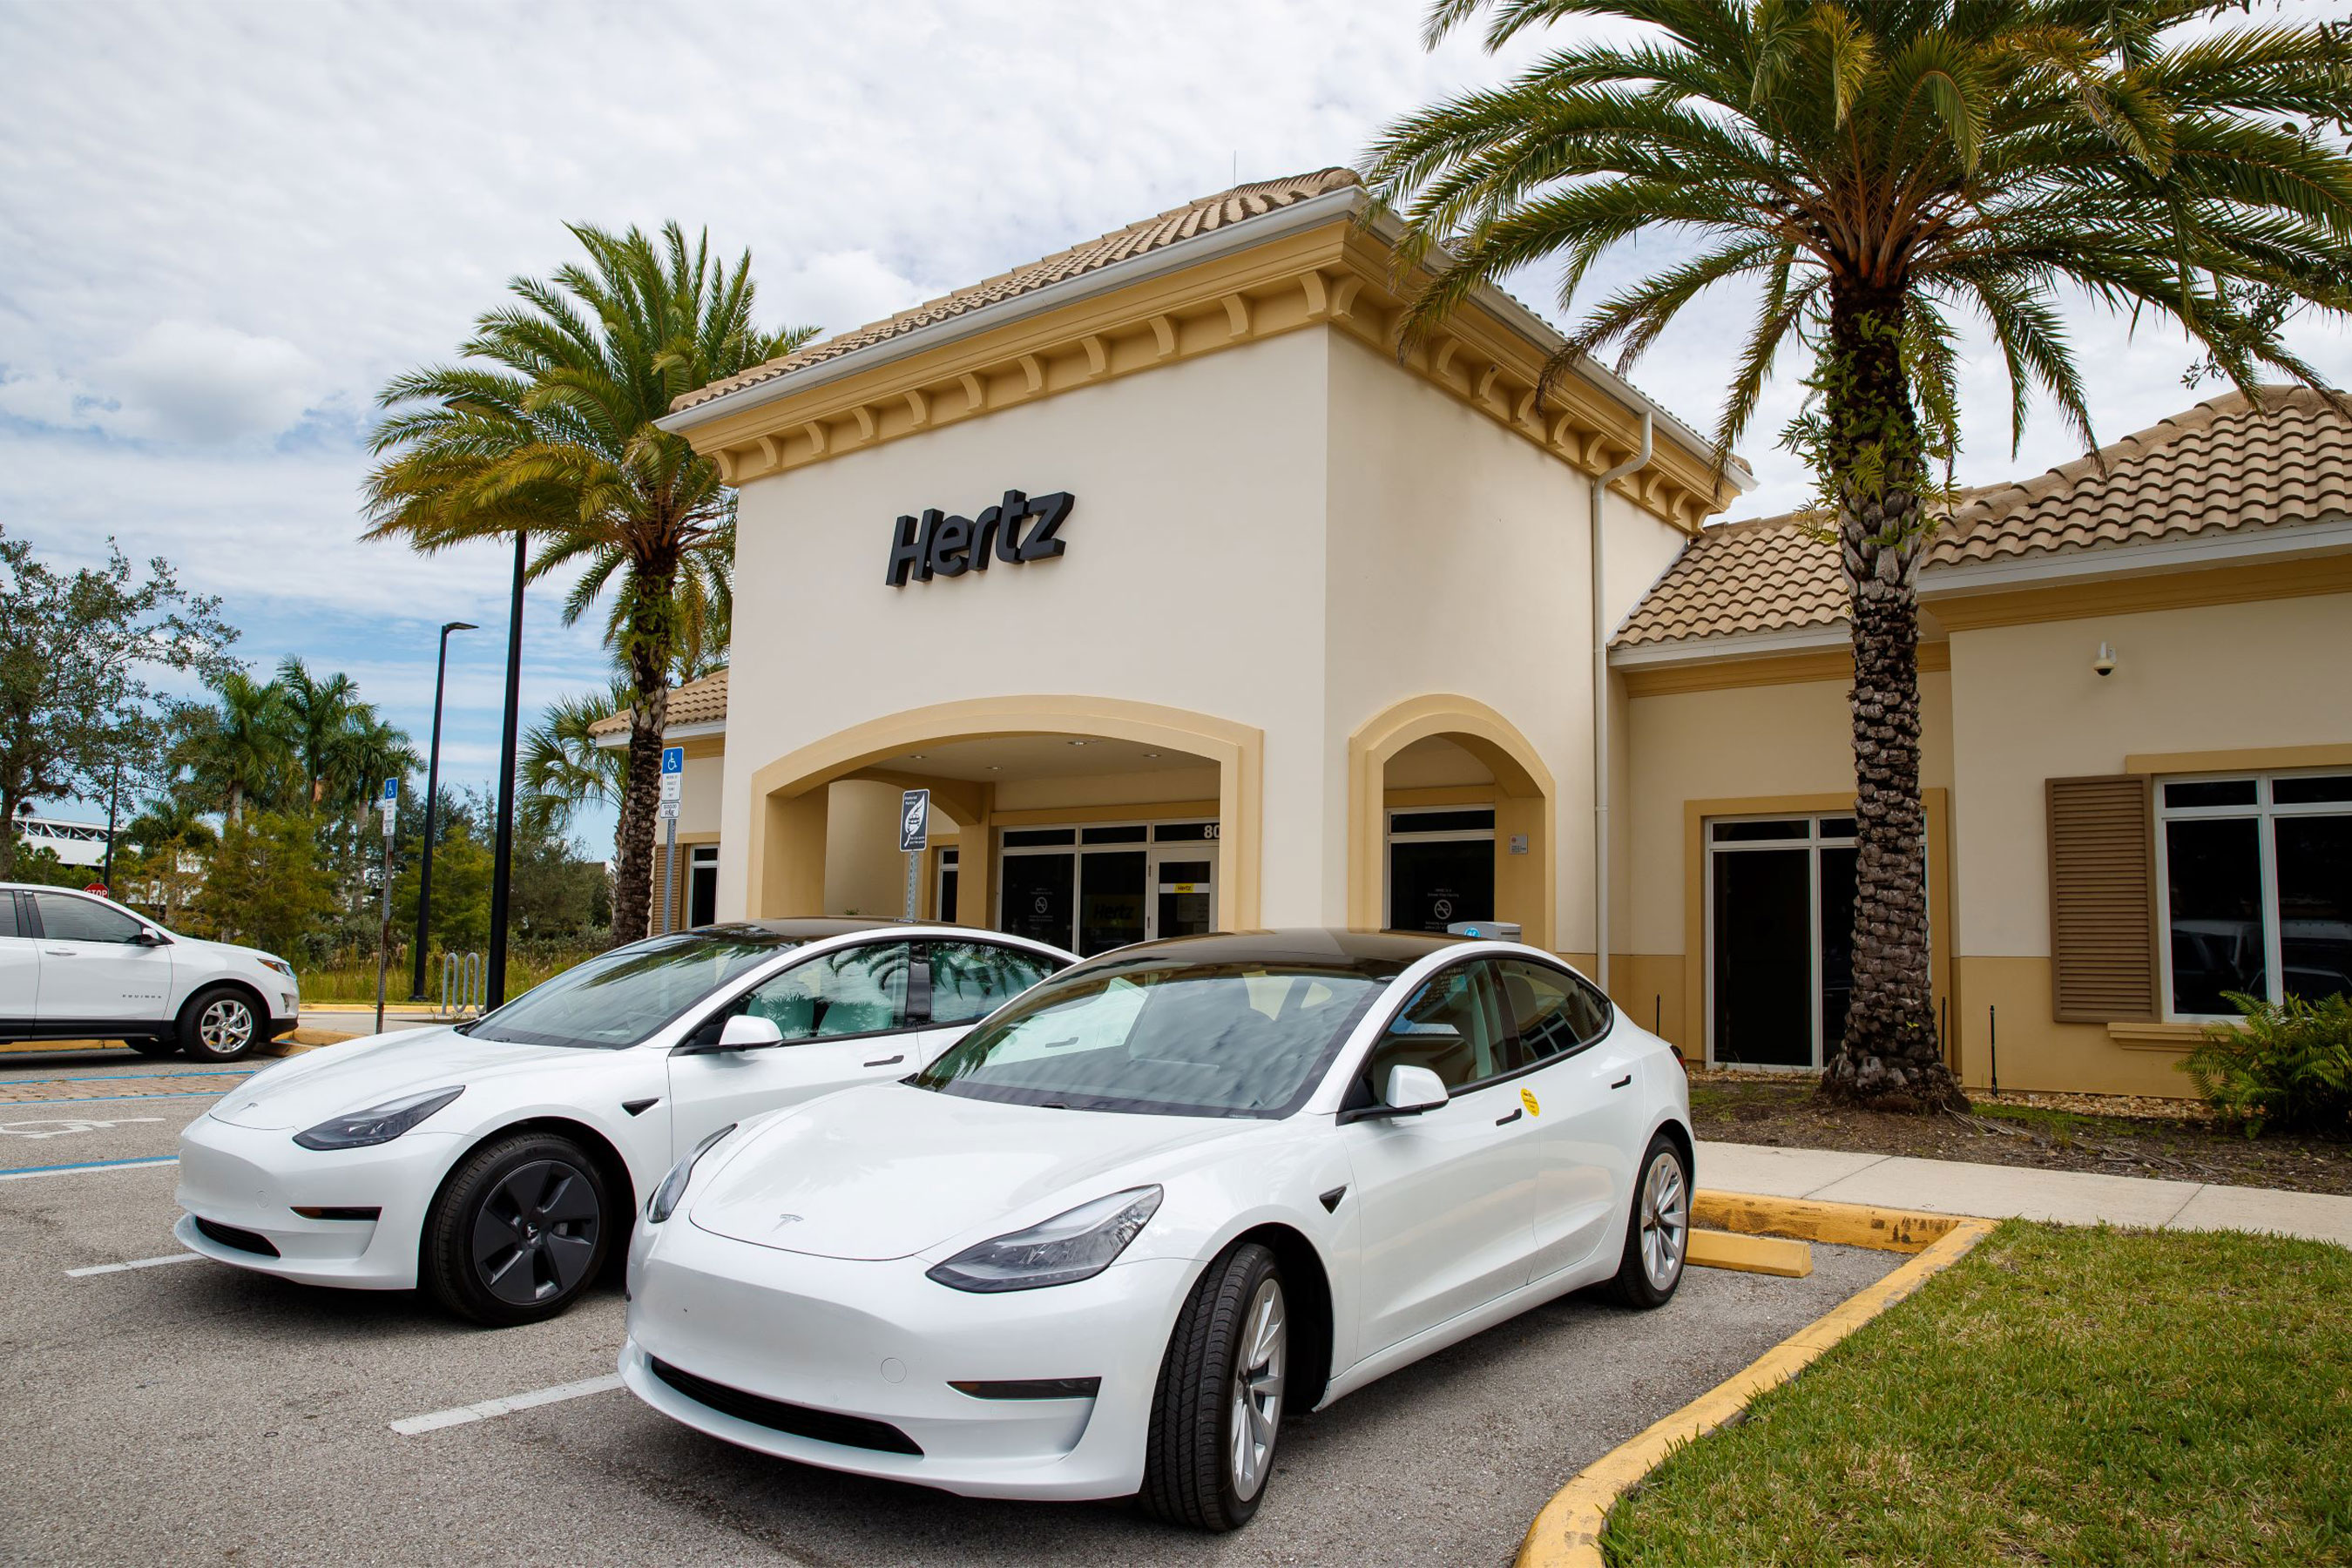 Tesla Model 3 electric vehicles at a Hertz neighborhood location.